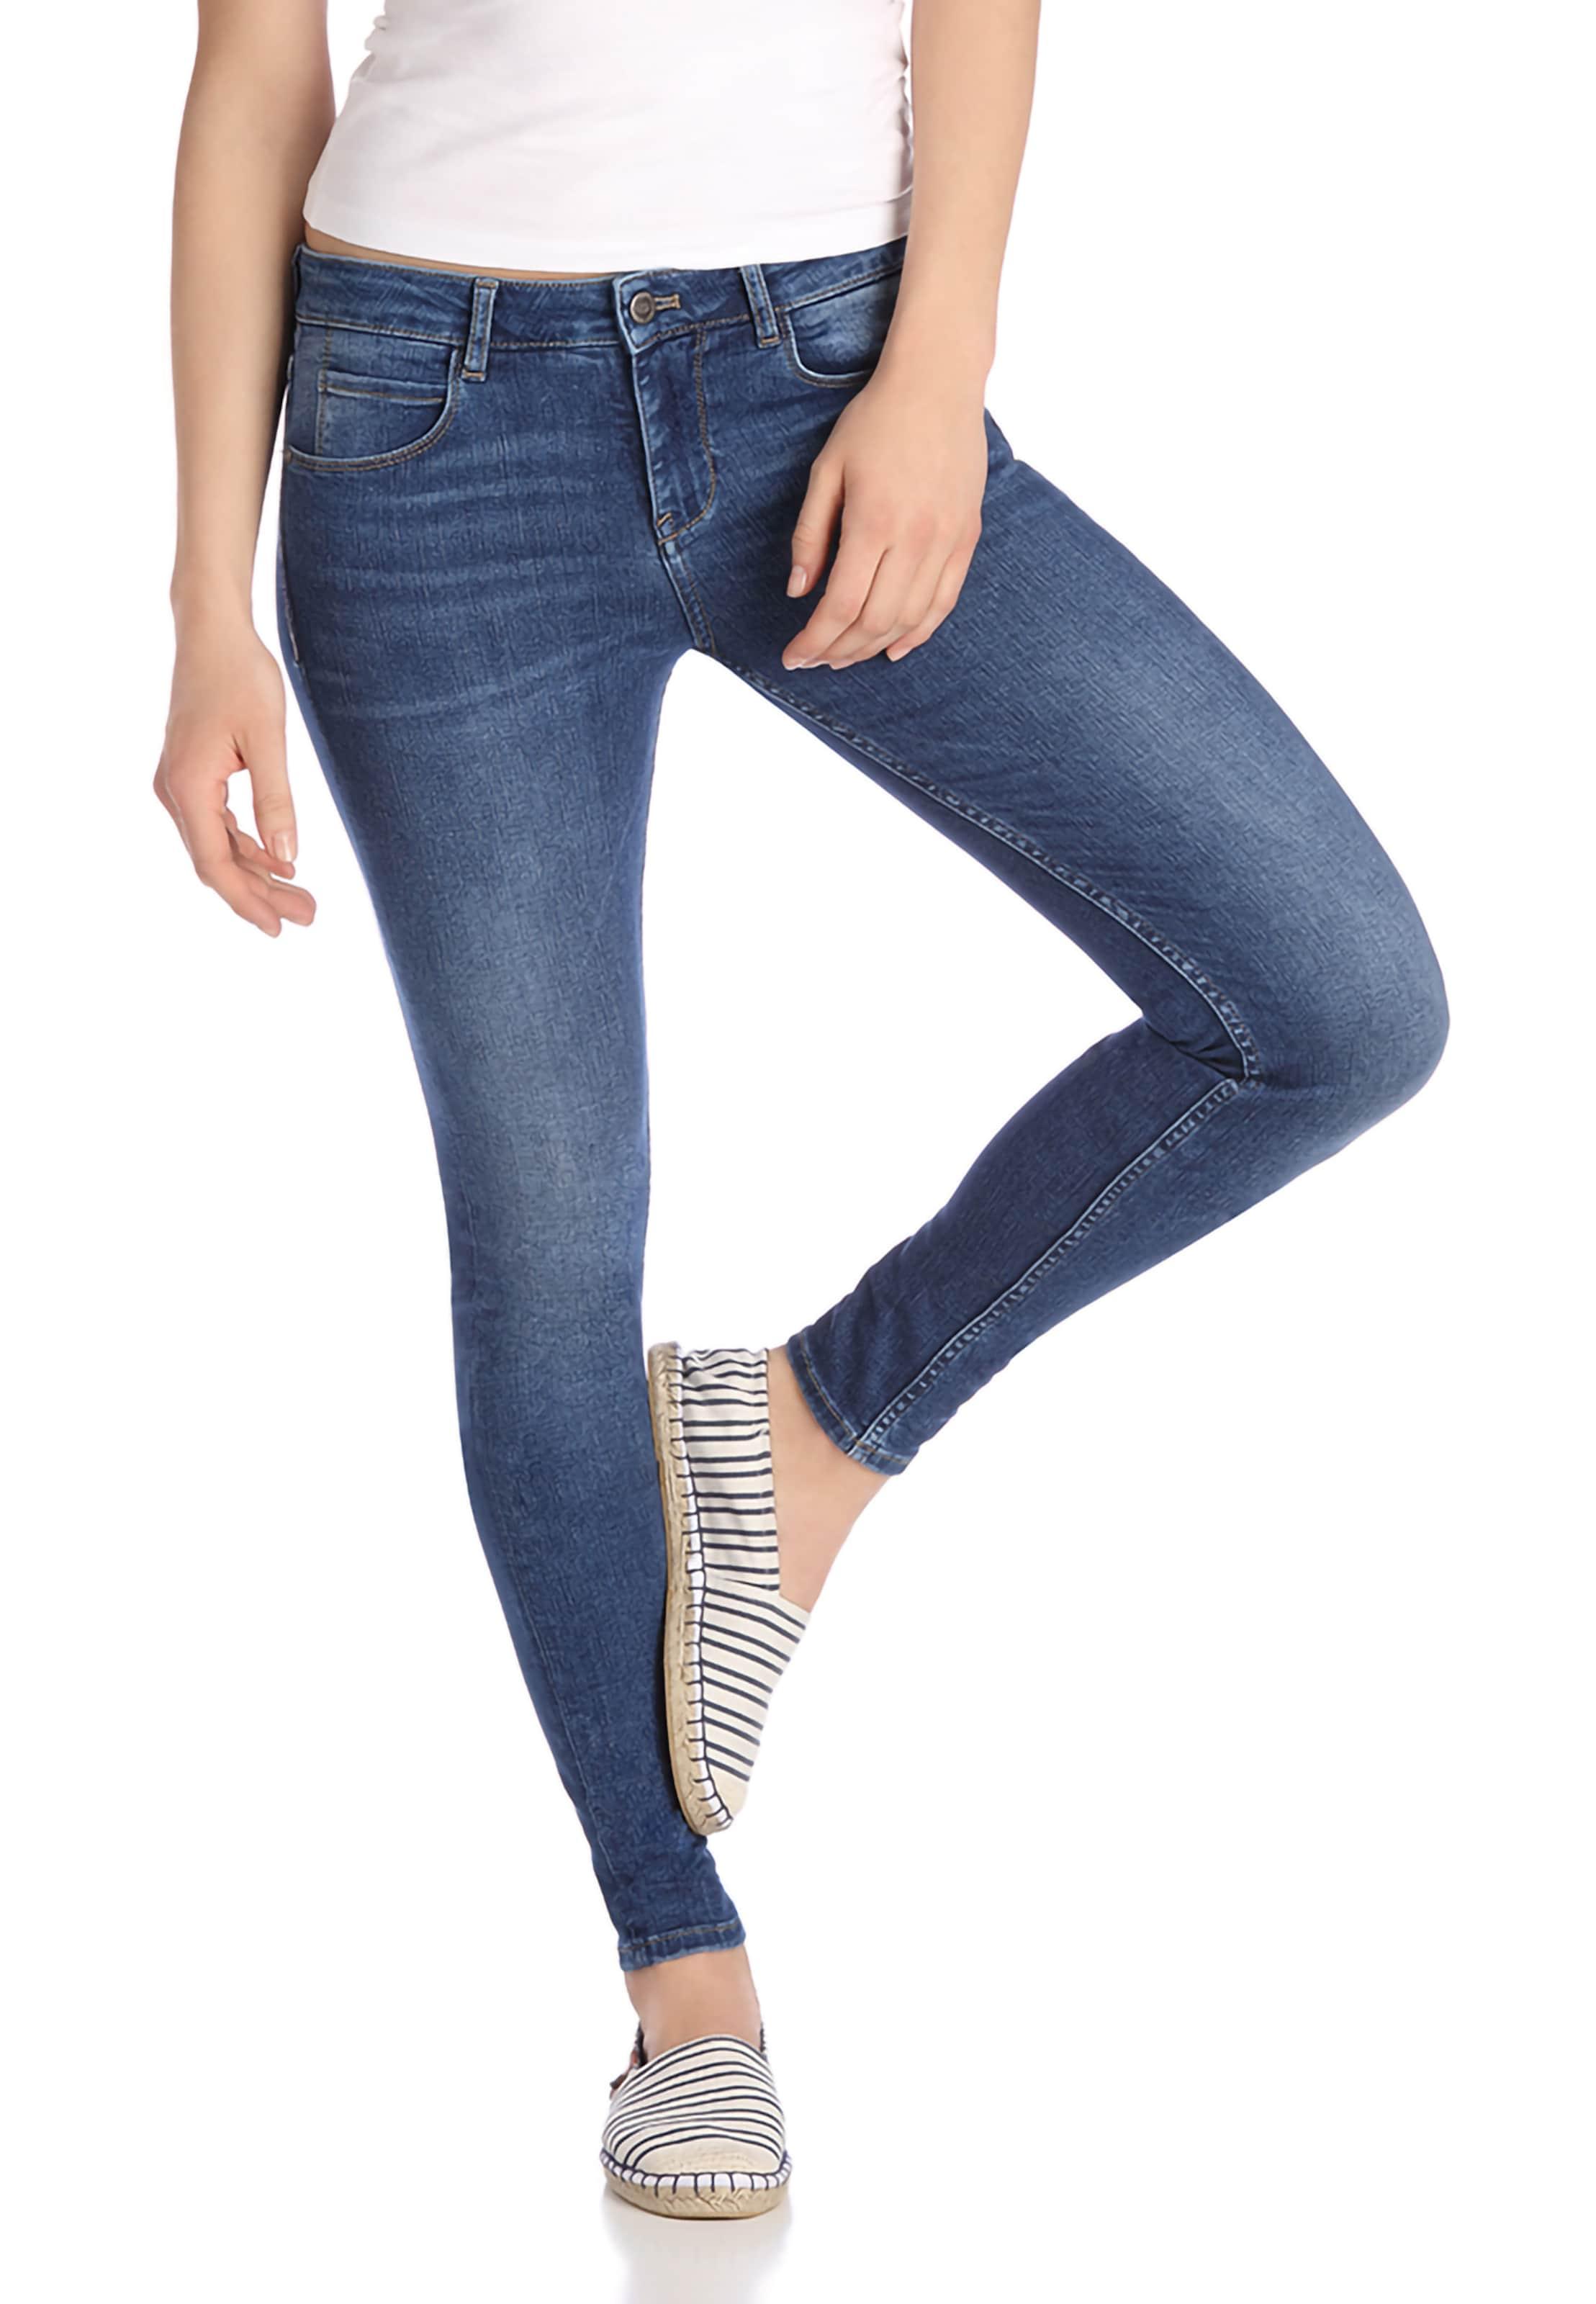 Jeans Aus In Fritzi Preußen 'downey' Blau PNnXOk0w8Z